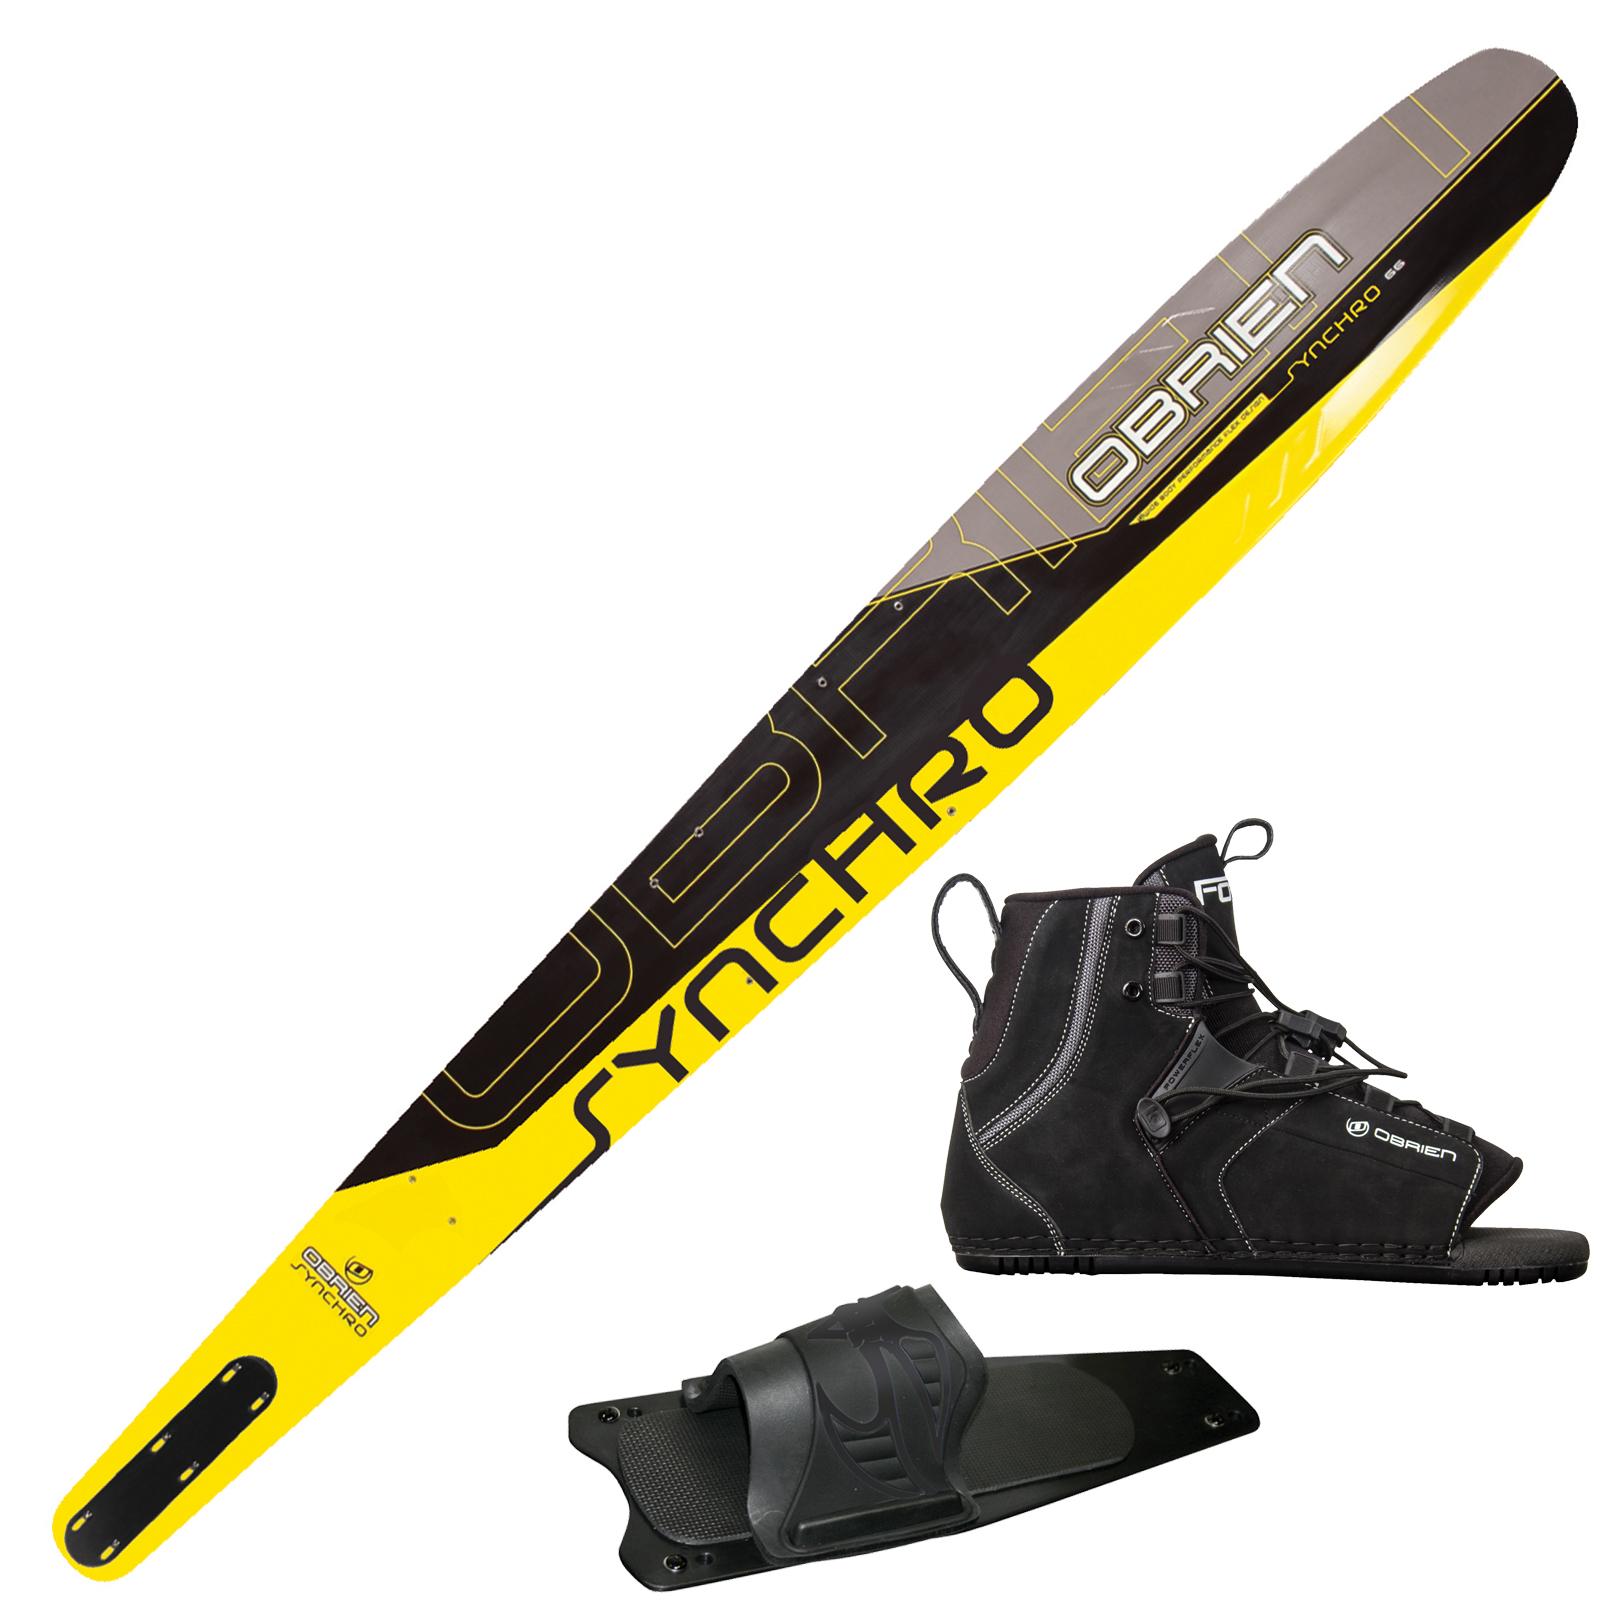 O'Brien Synchro Slalom Waterski Force Binding And Rear Toe Plate